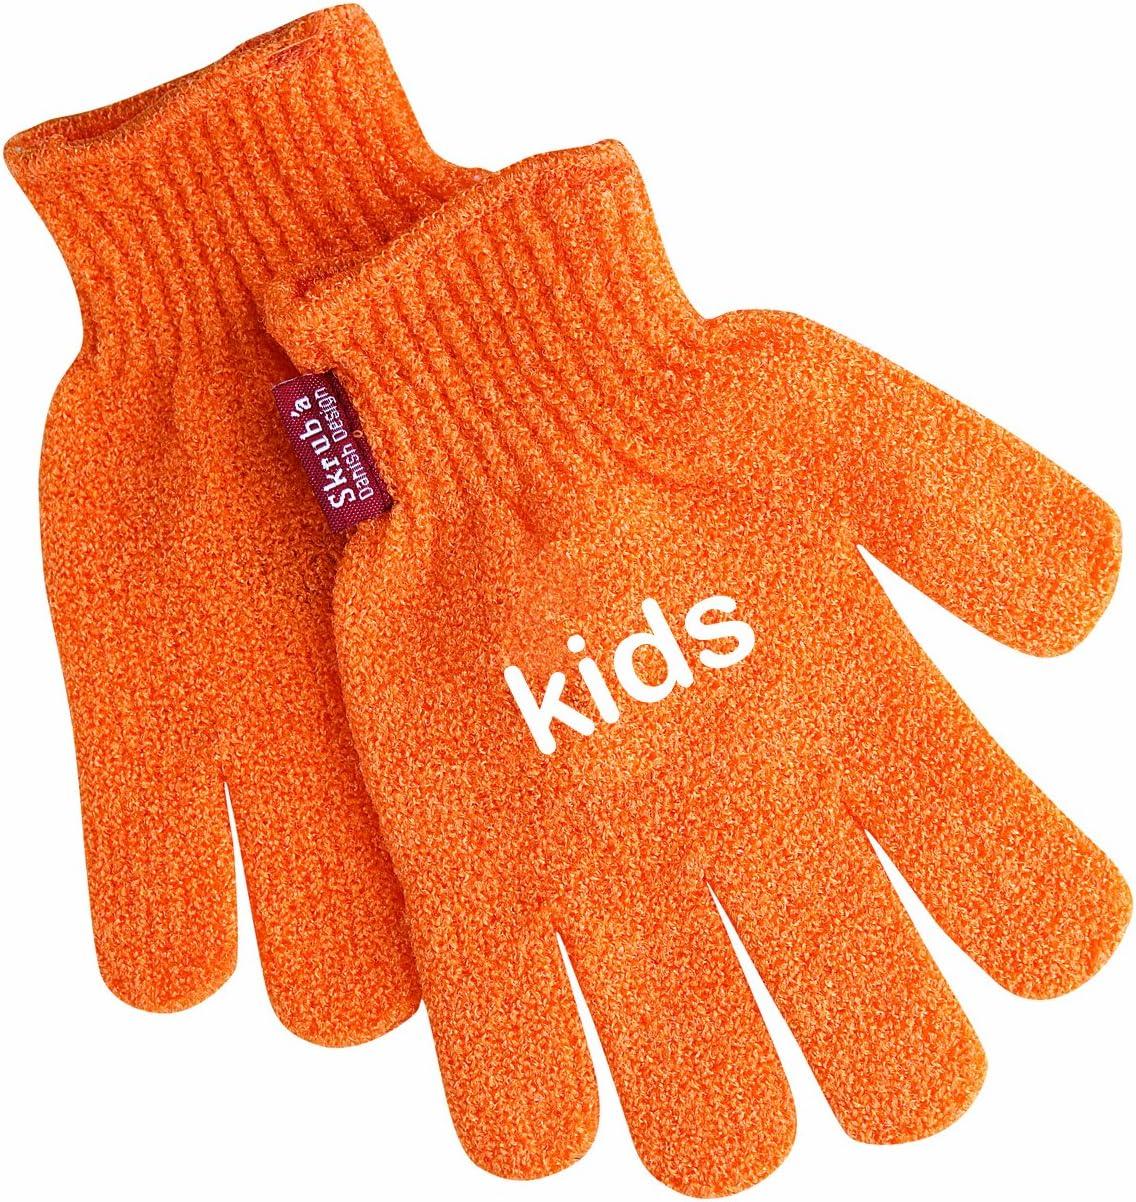 Amazon.com: Fabrikators Skrub'a Kids Glove, Carrot Kids, 1-Pair: Kitchen &  Dining